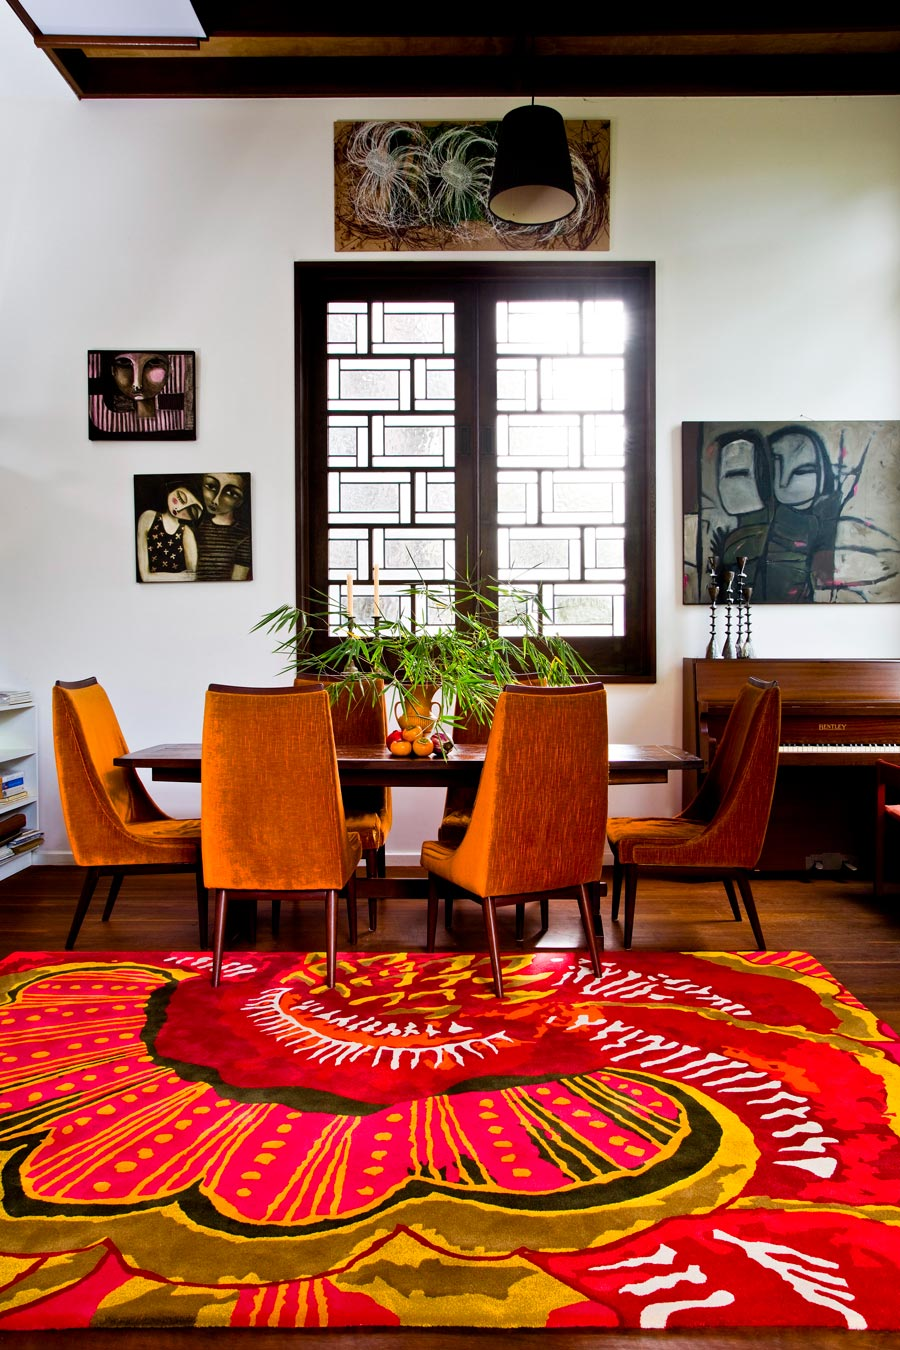 location dining room shot of splendida rug by easton pearson